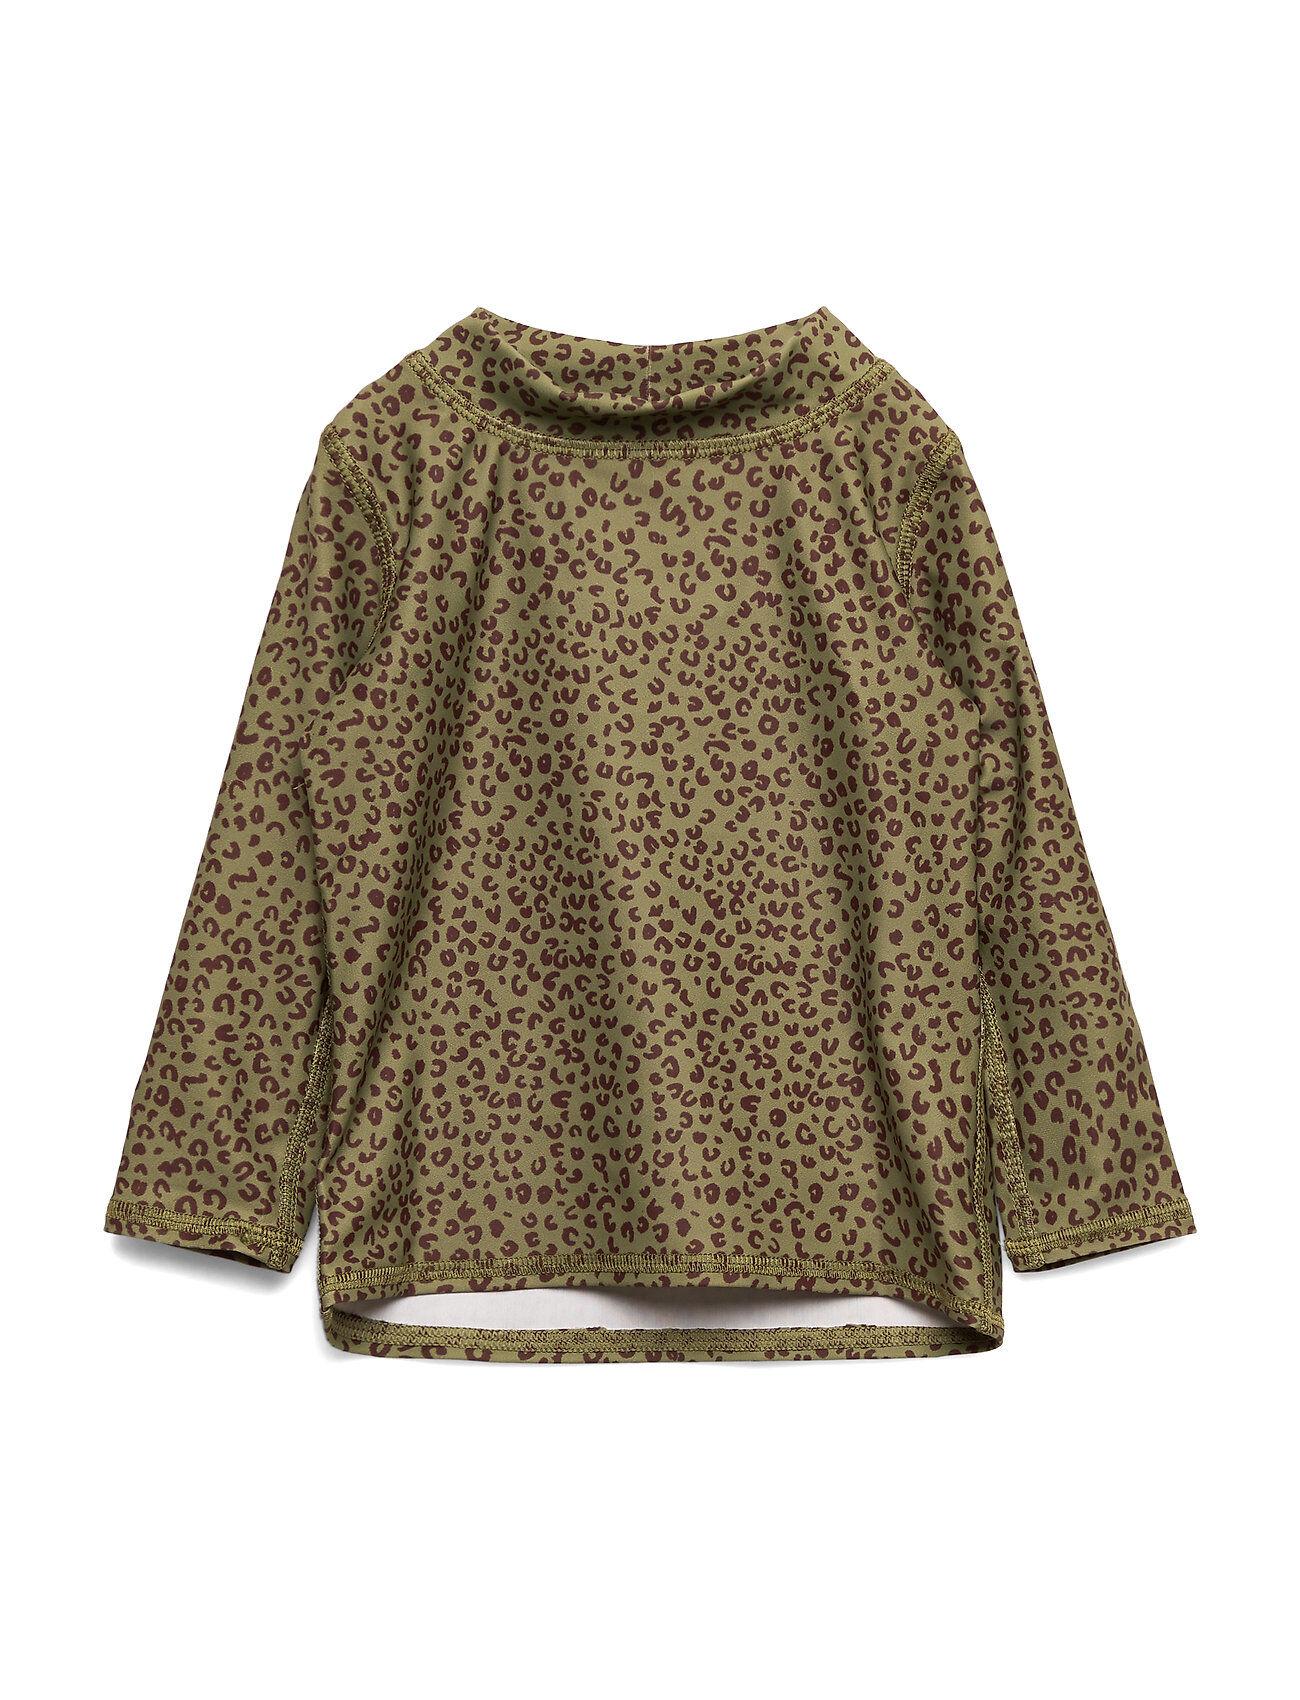 Image of Soft Gallery Baby Astin Sun Shirt Swimwear UV Clothing UV Tops Vihreä Soft Gallery